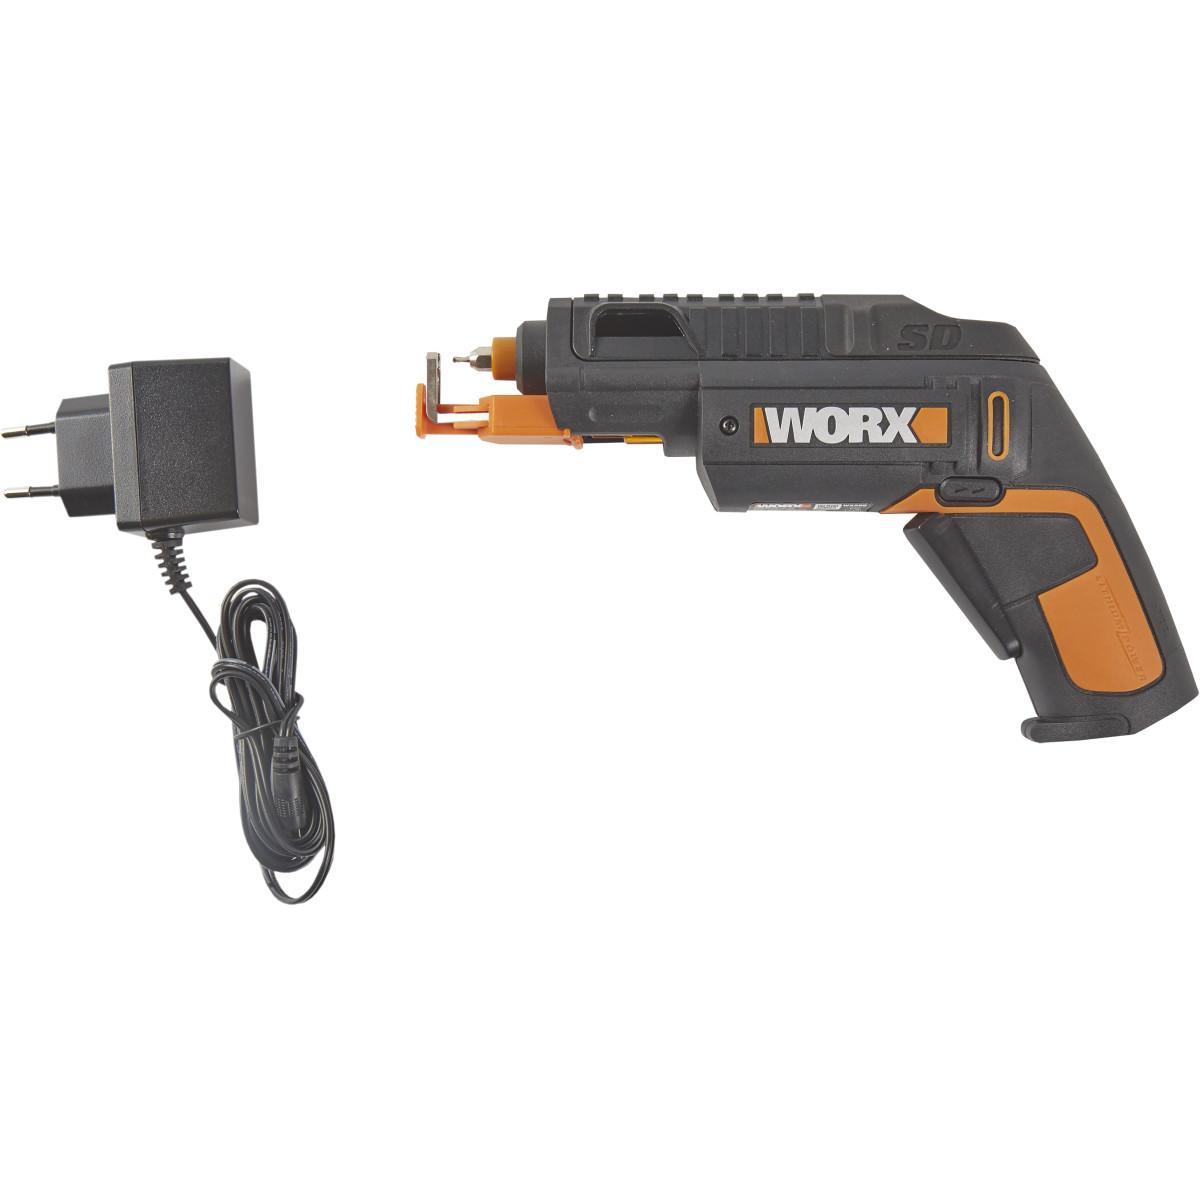 Отвертка Аккумуляторная Worx Wx255 Sd Slide Driver 4 В Li-Ion 15 Ач